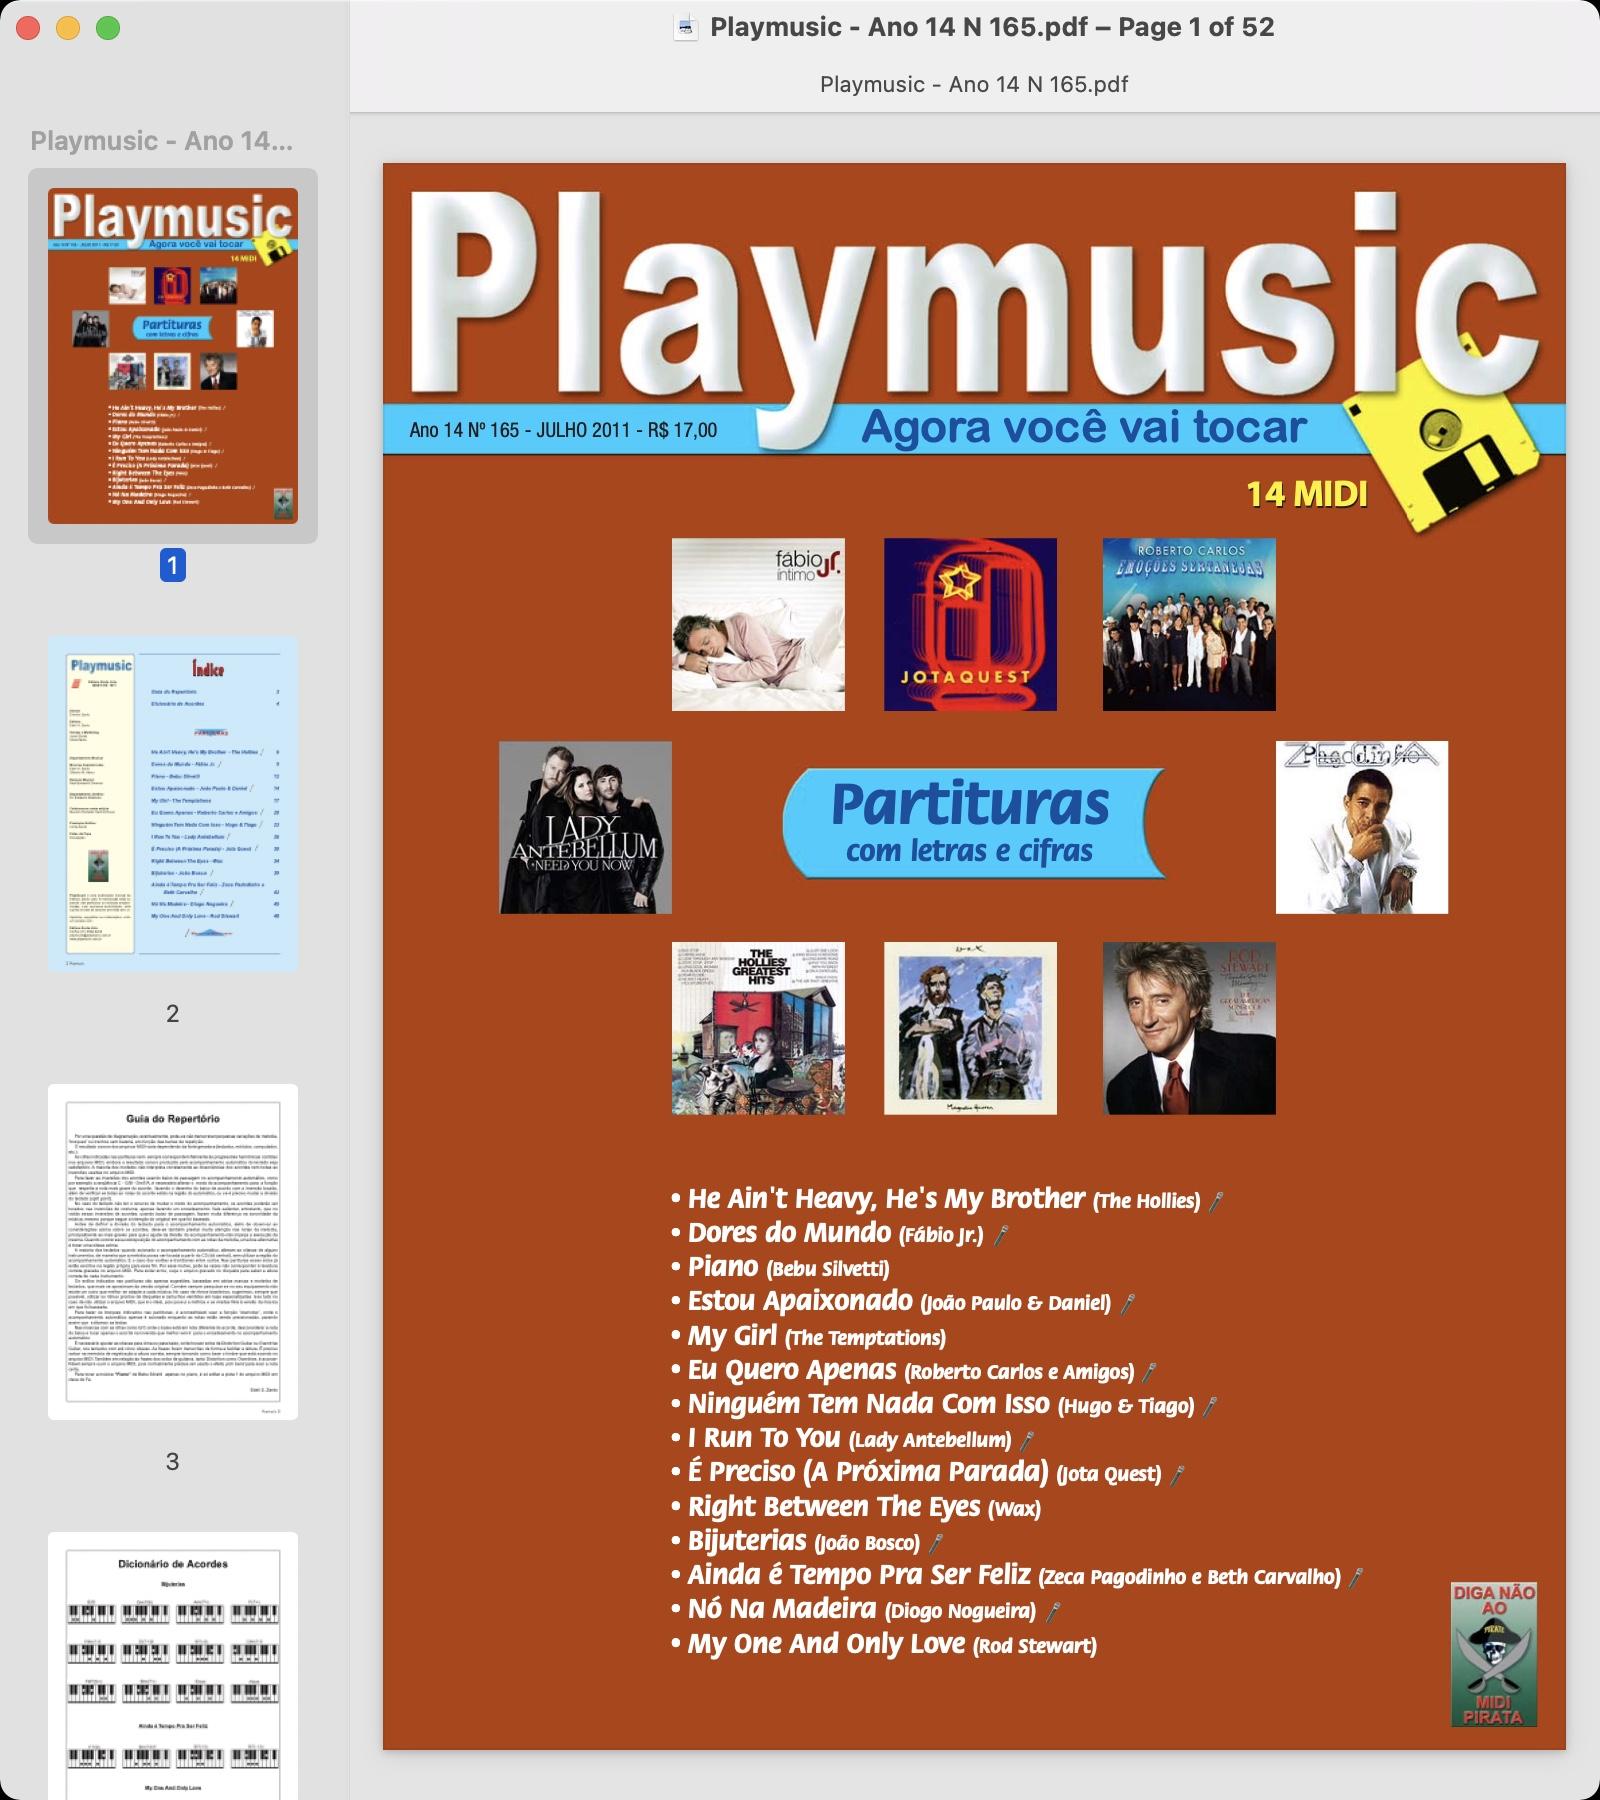 Playmusic - Ano 14 N 165.jpg